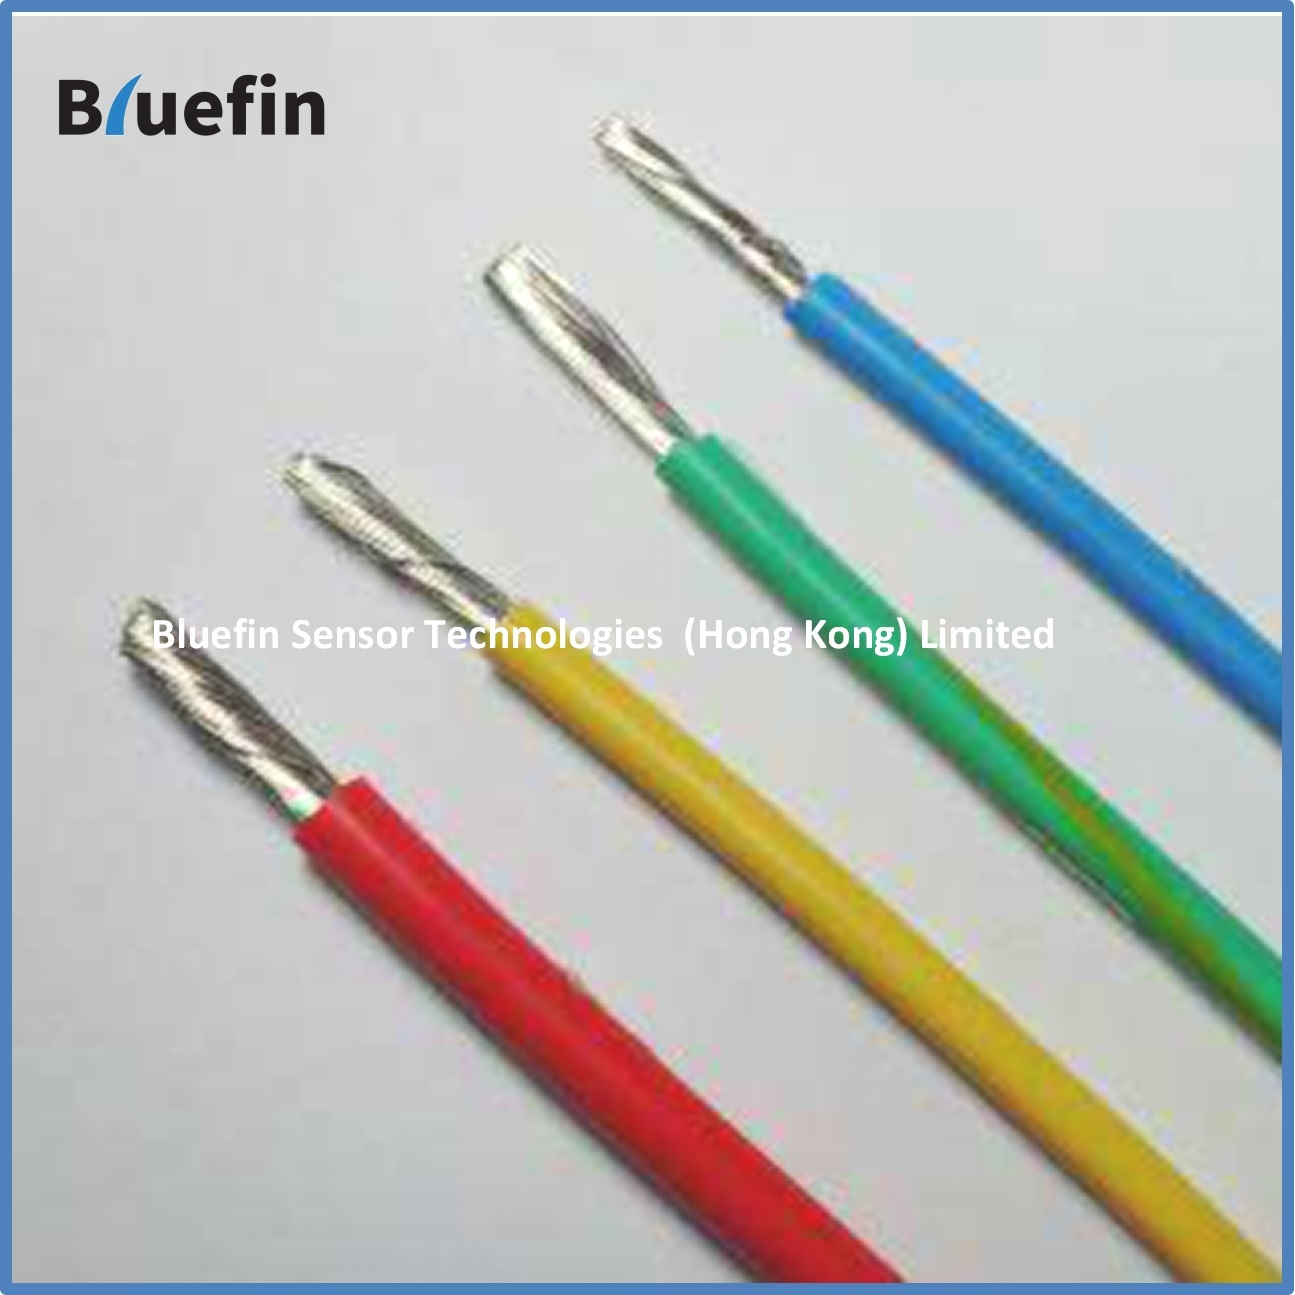 China UL1015/UL1007/UL1061/UL1095/UL1571 Wire and Cable - China ...